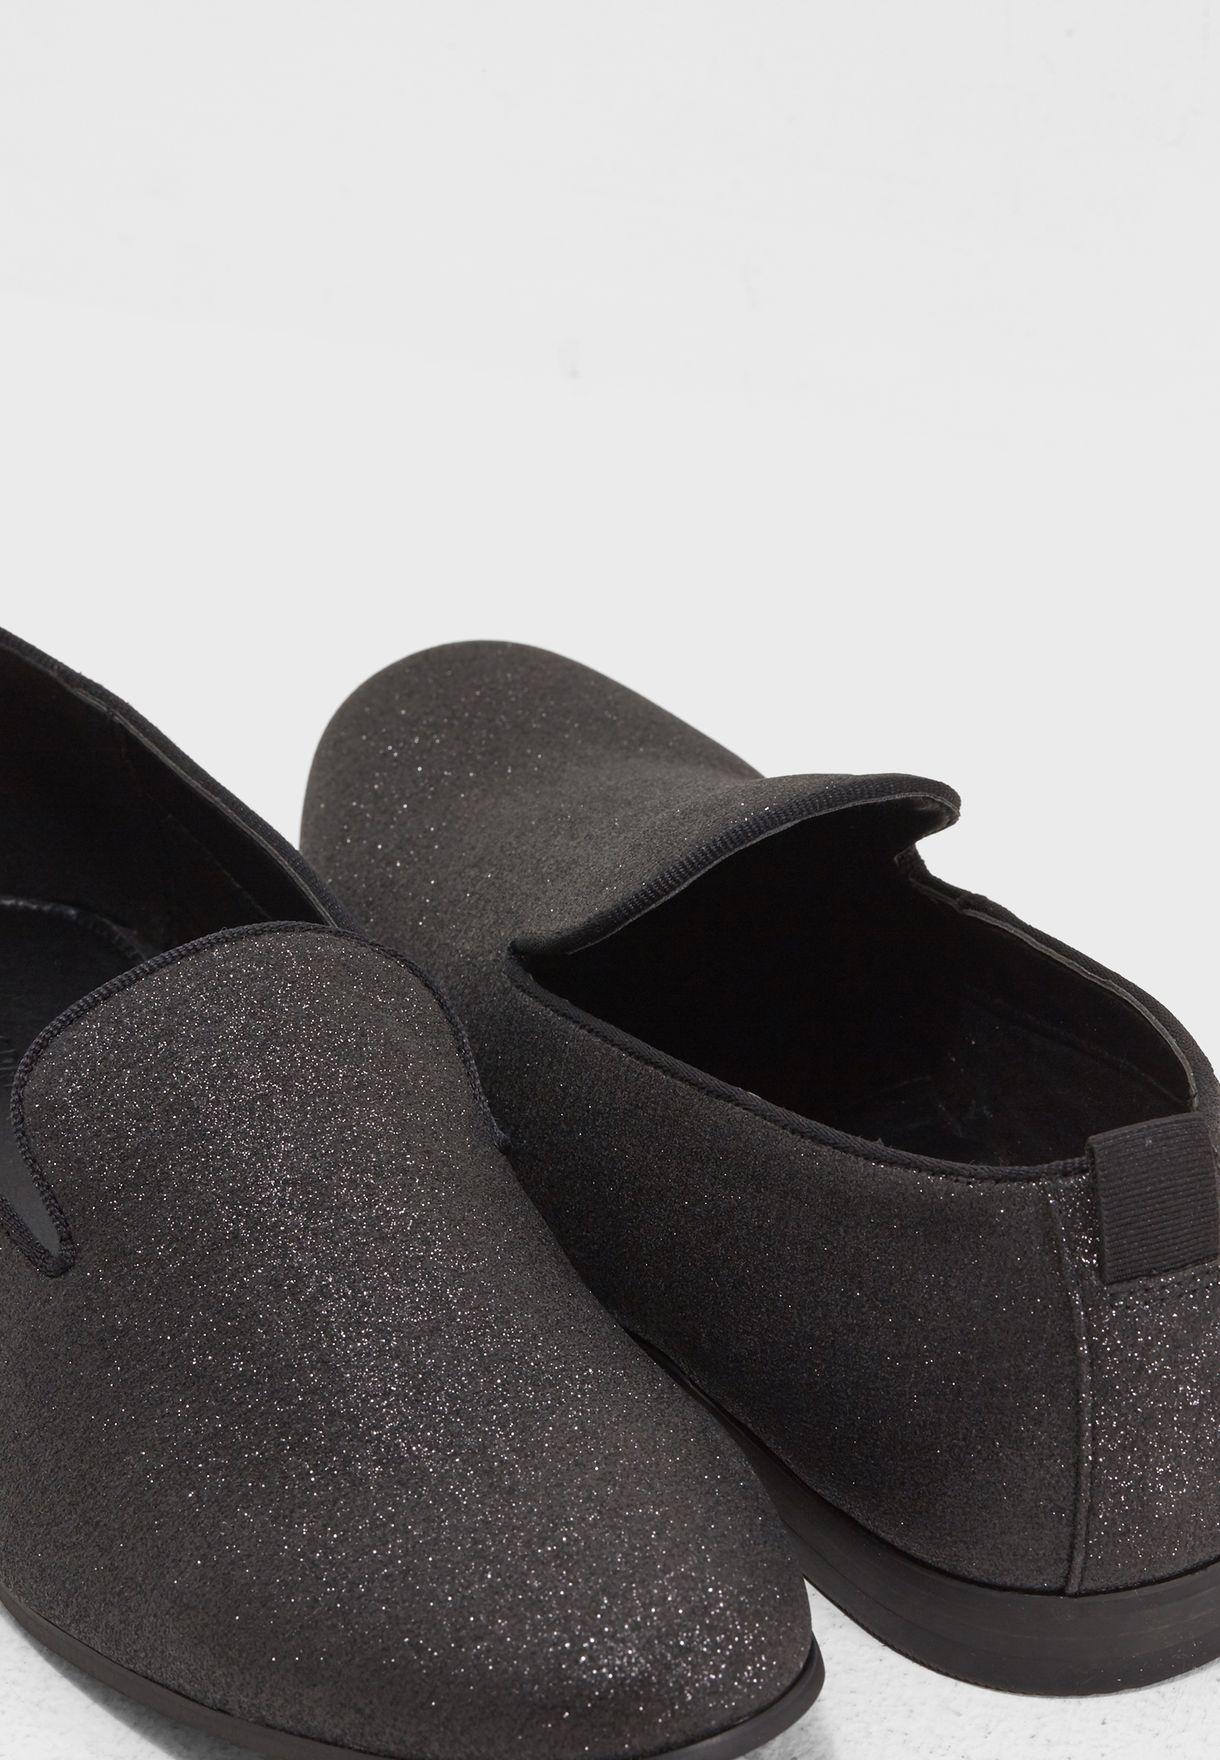 حذاء عصري براق